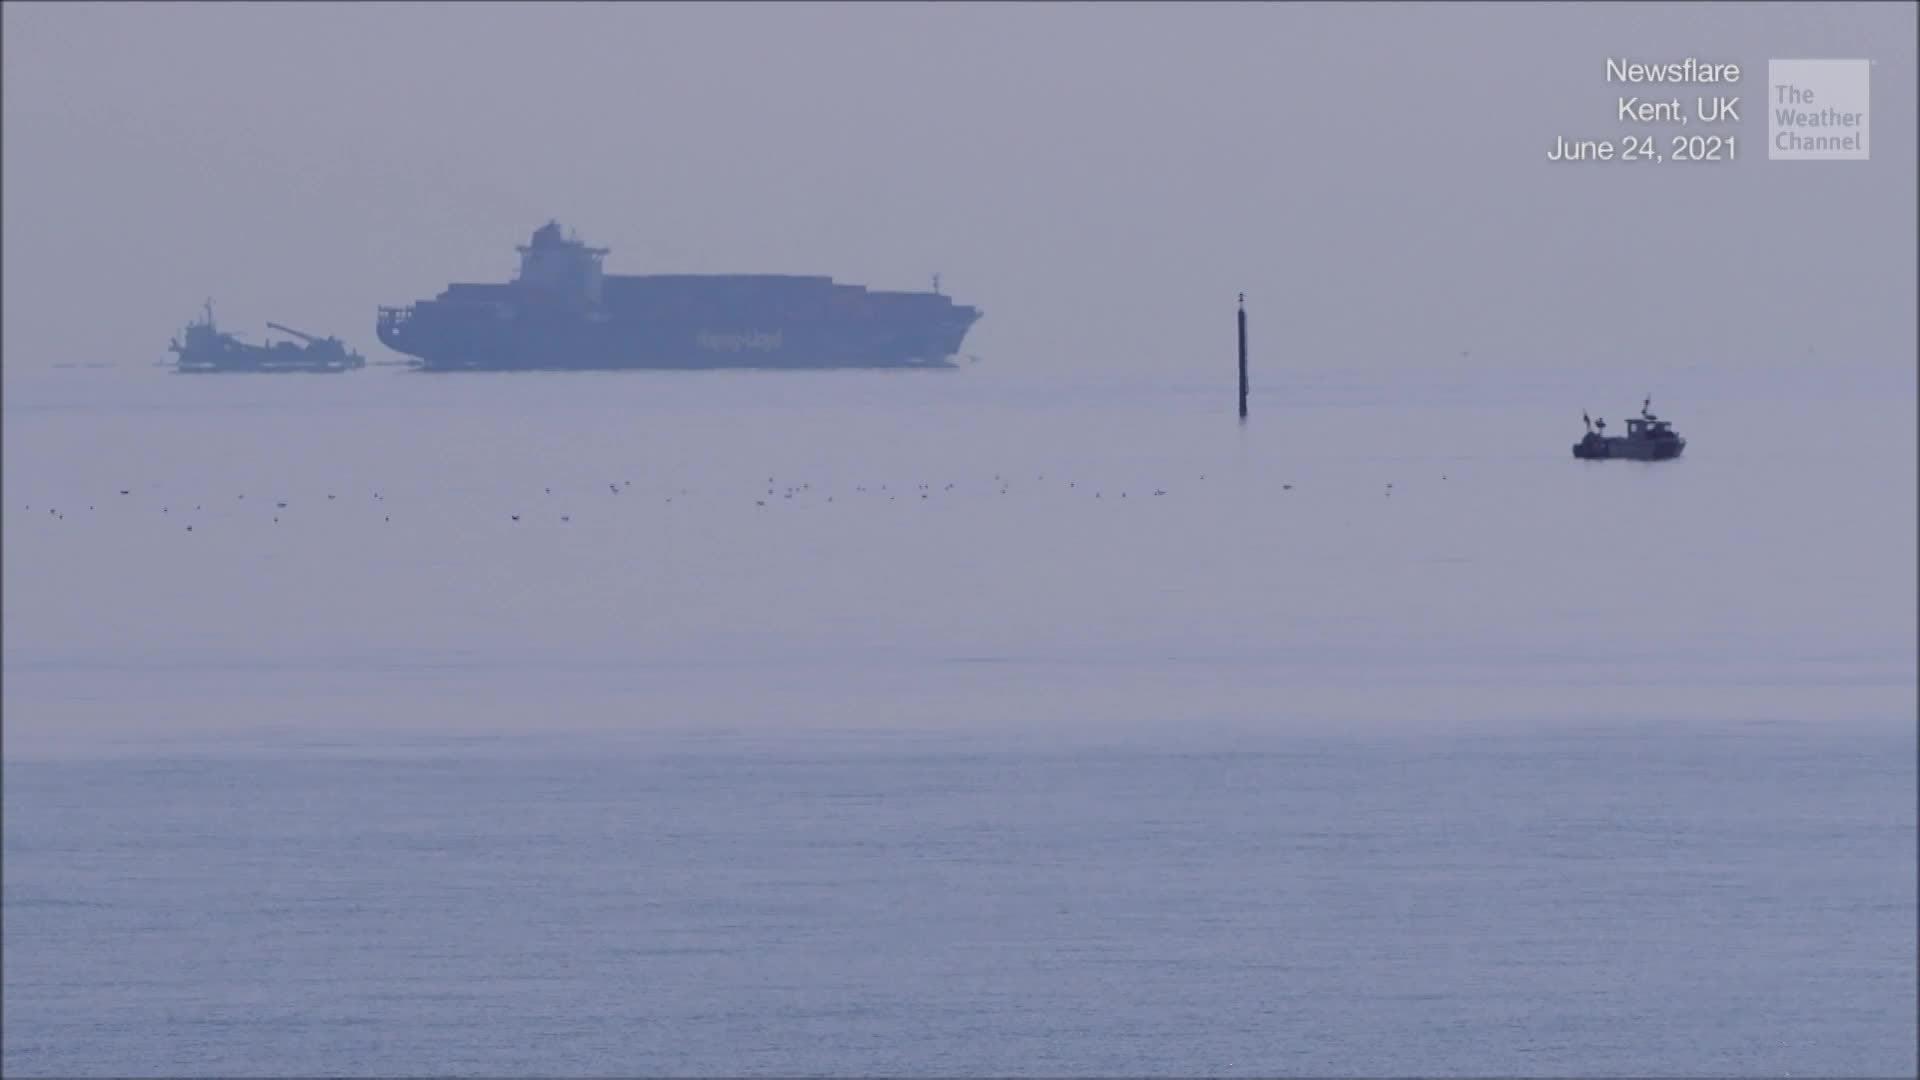 Is UK Flying Ship Fata Morgana or False Horizon?